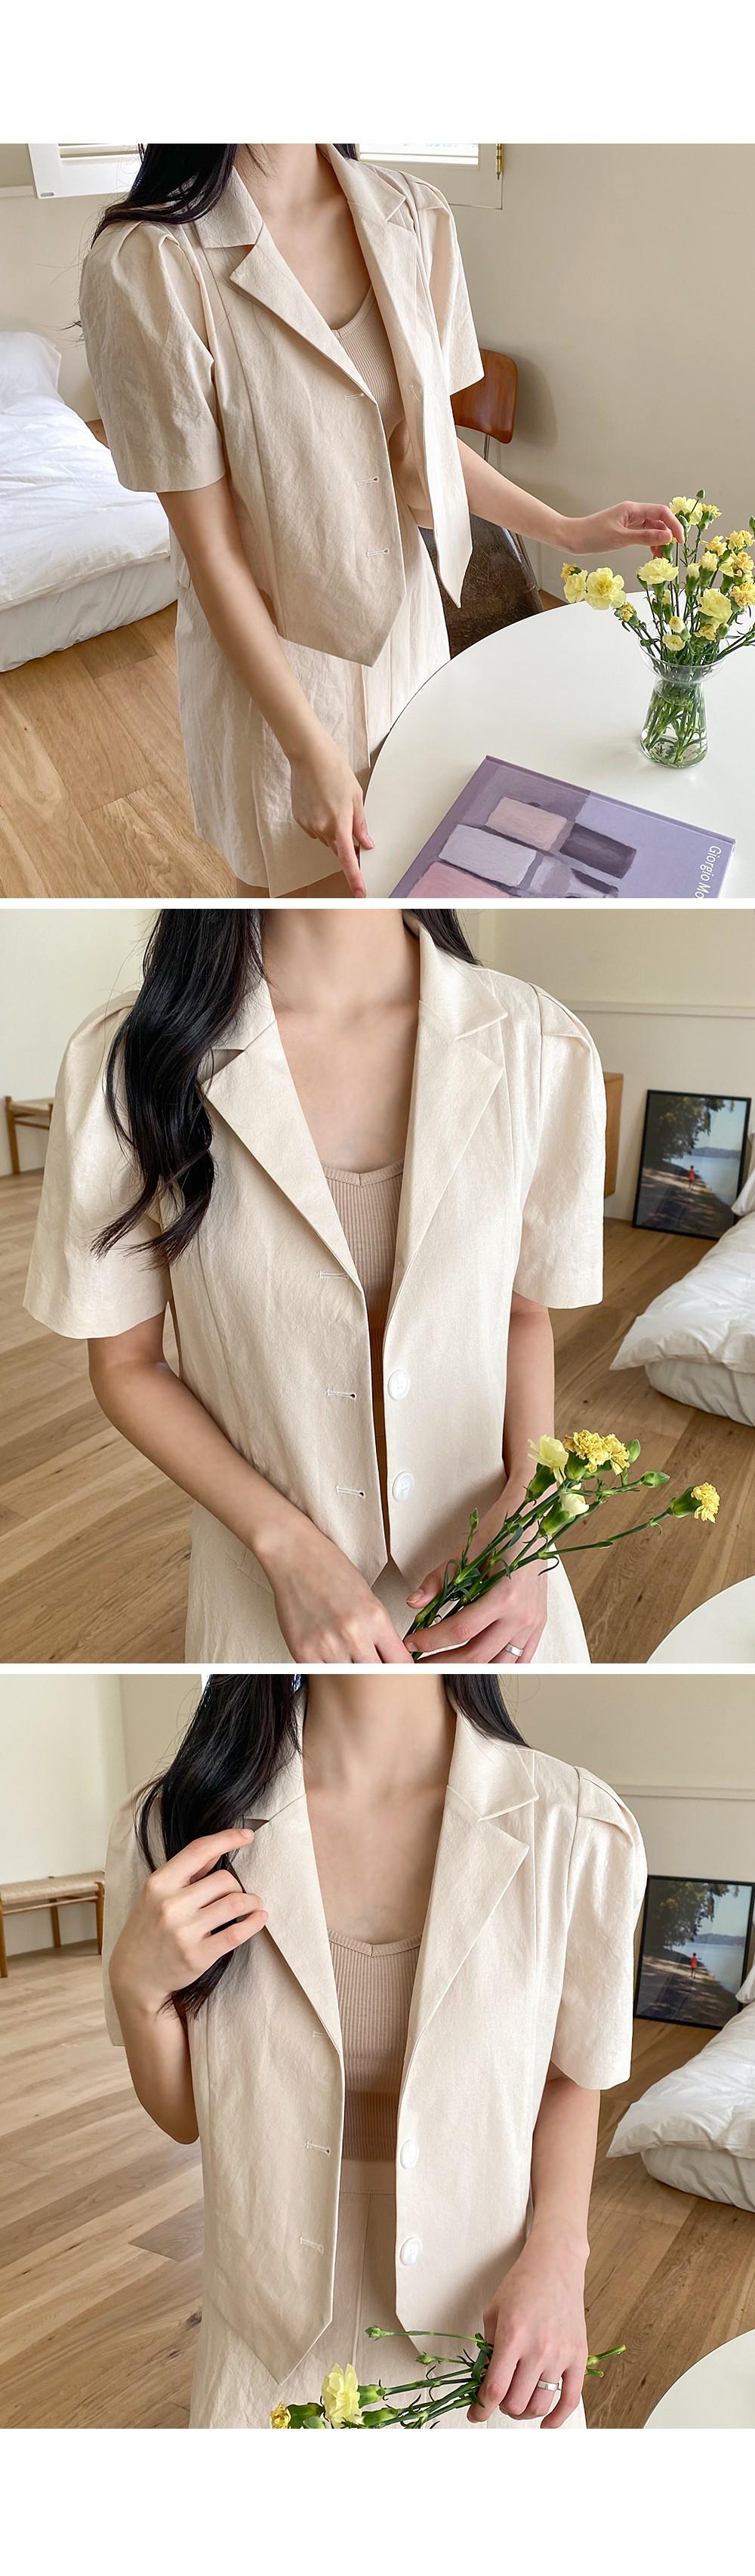 1+1 artificial vivid sleeveless cropped Sleeveless